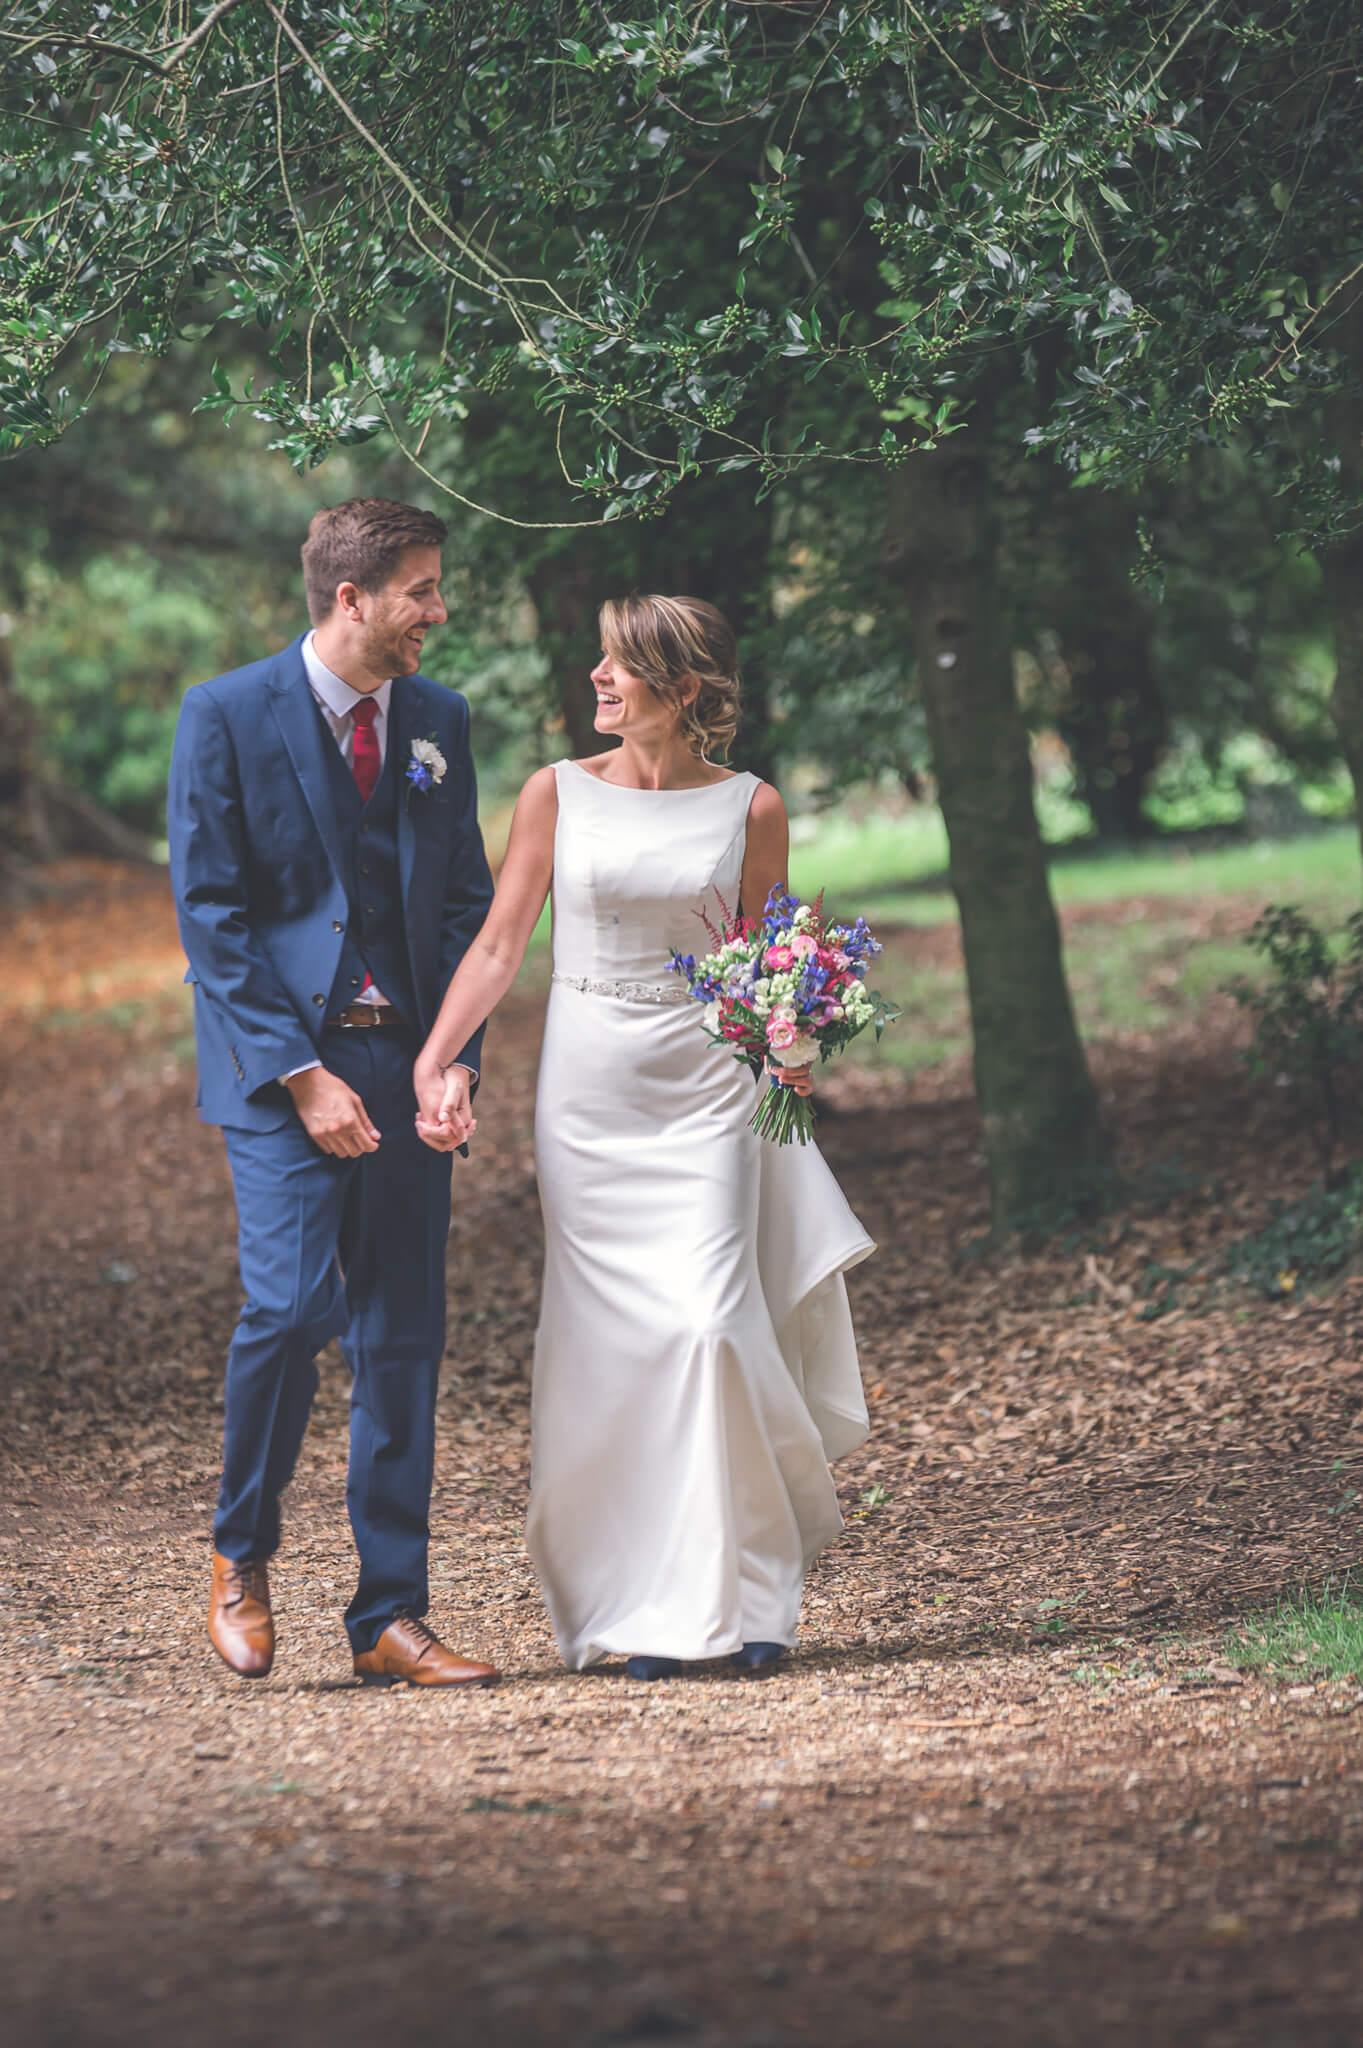 Wedding dress photo by Ryan Hewett Photography